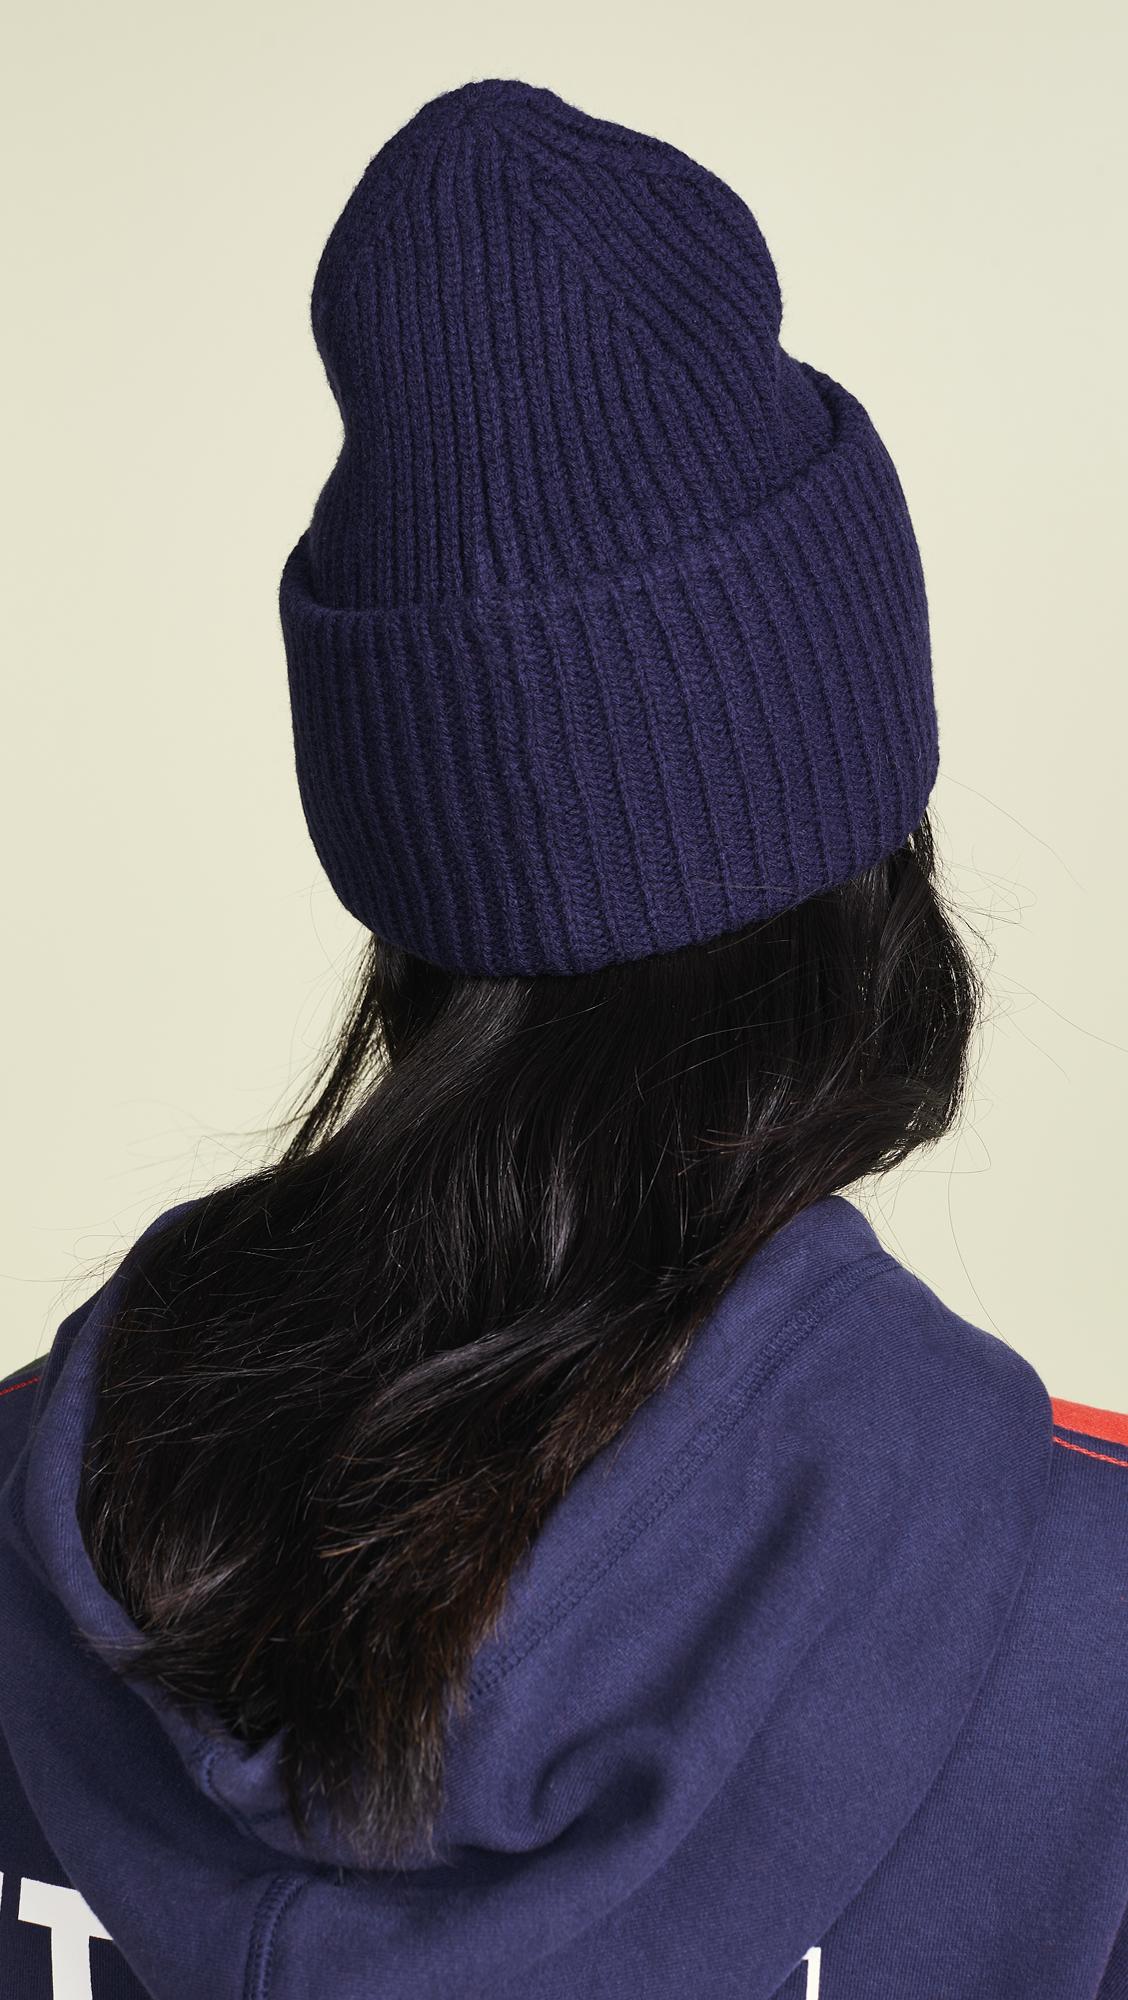 750ddb4d8ab Acne Studios Pansy L Face Hat